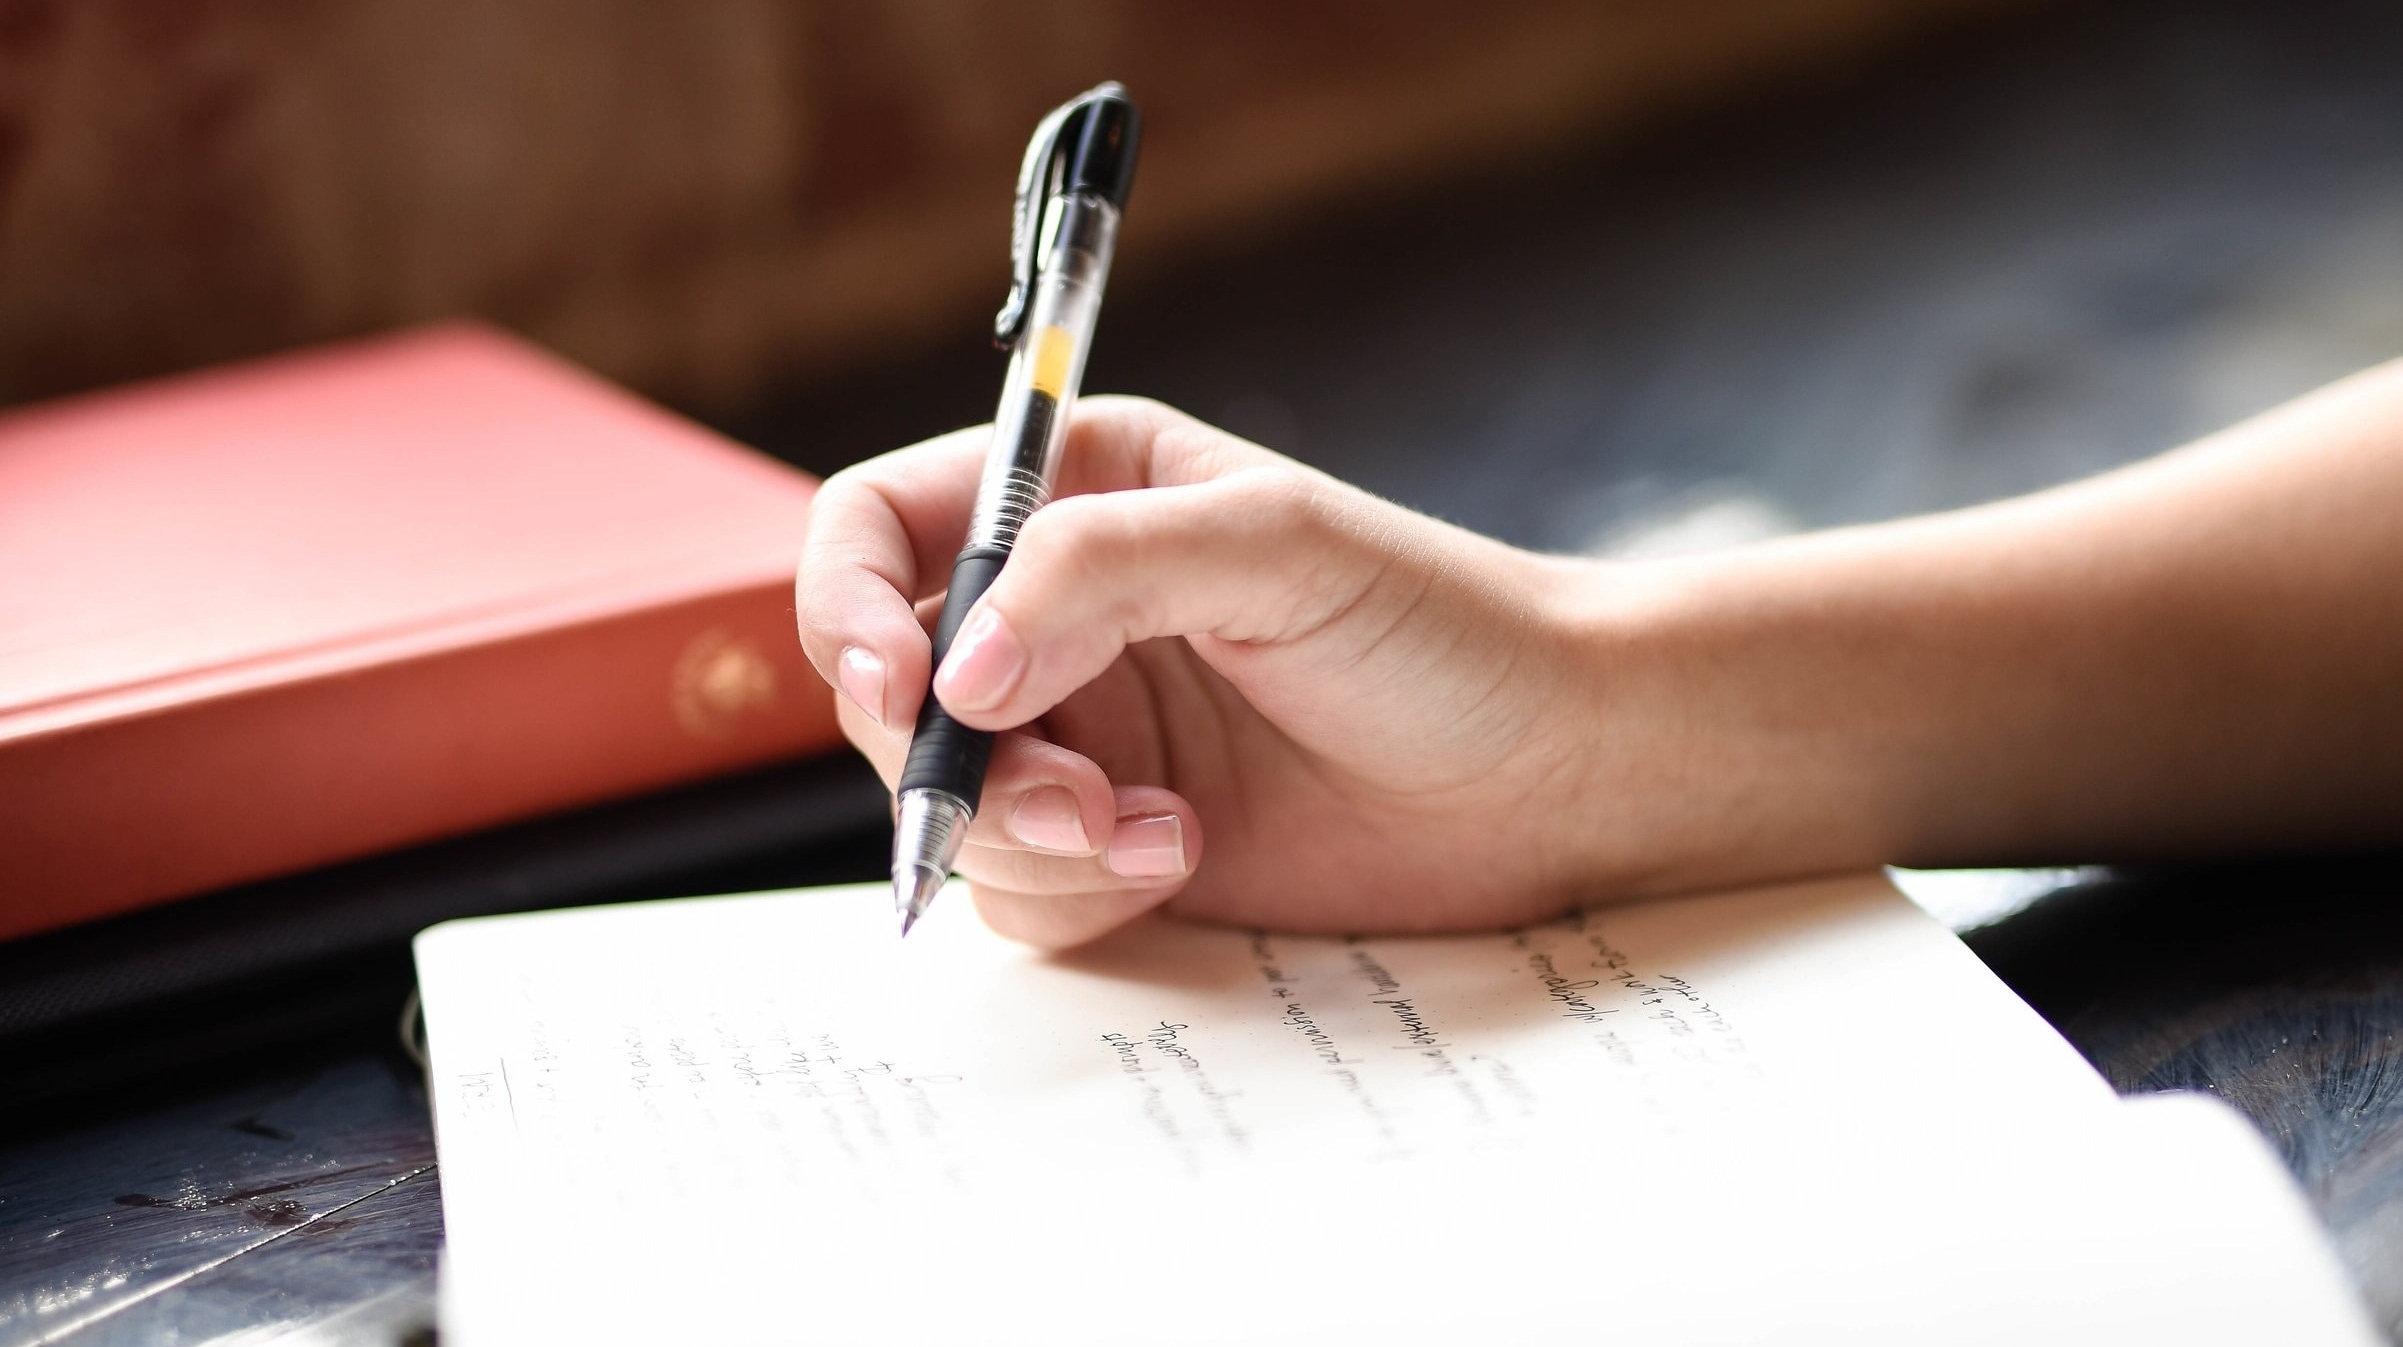 Journaling+and+writing